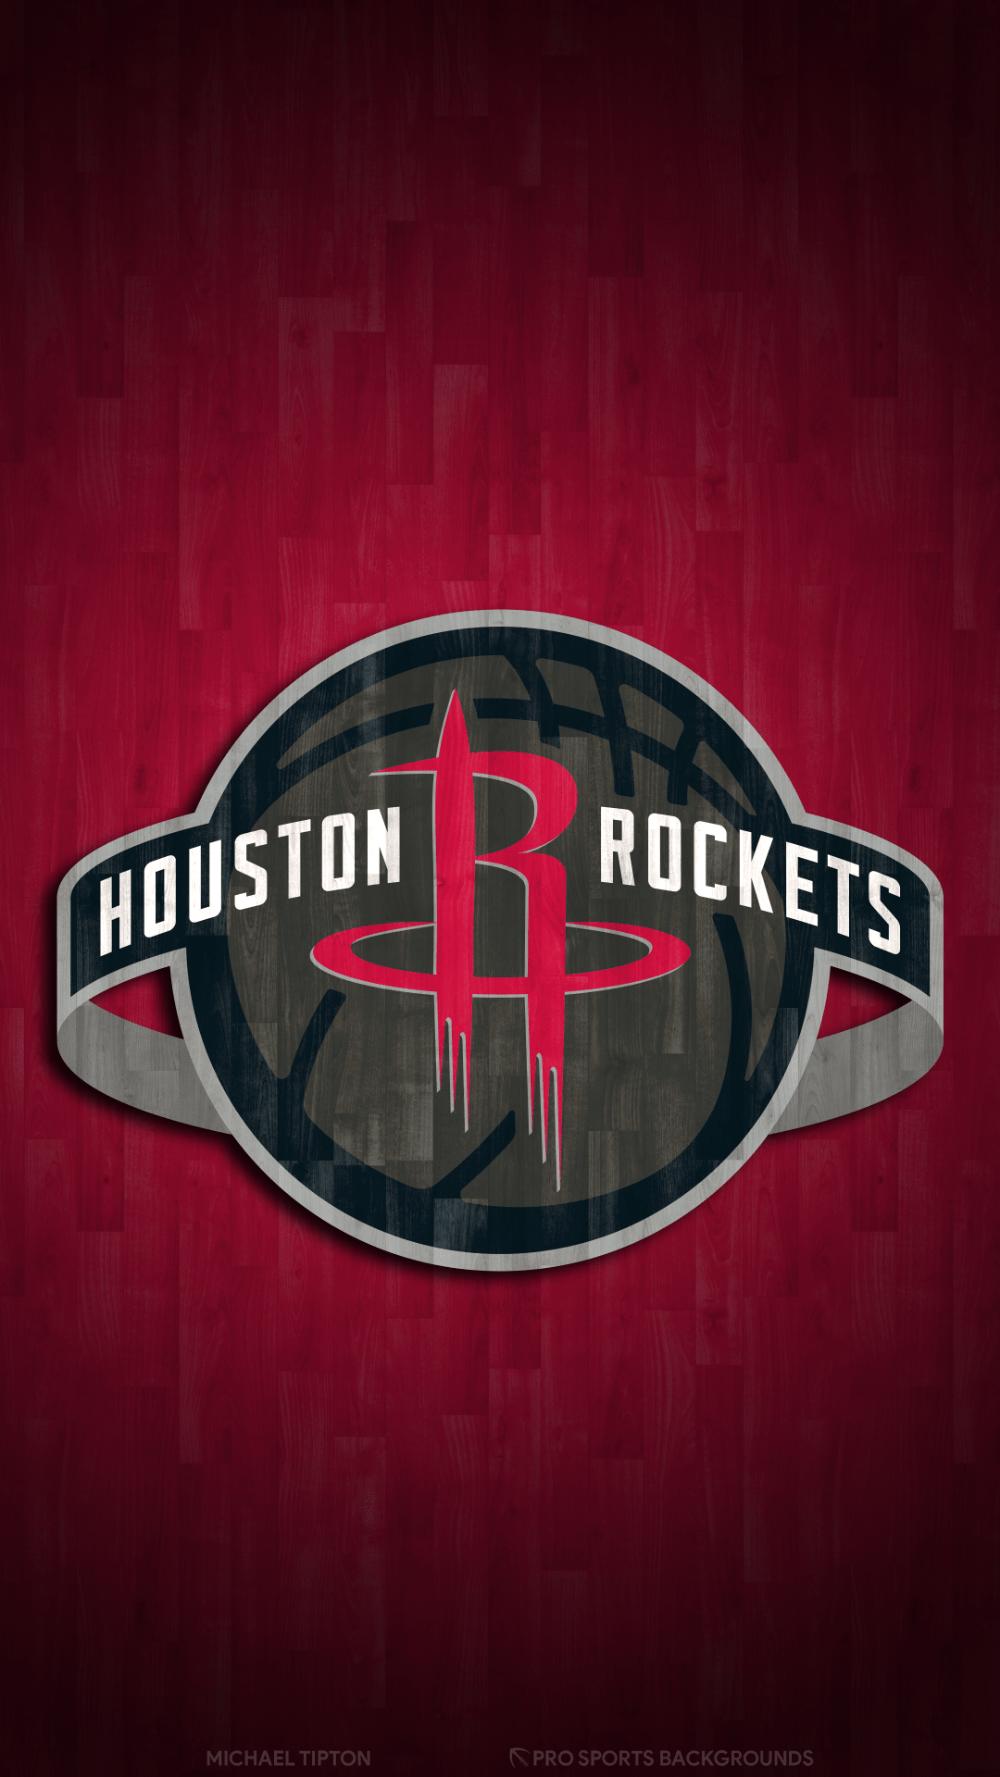 Houston Rockets Iphone Wallpapers Top Free Houston Rockets